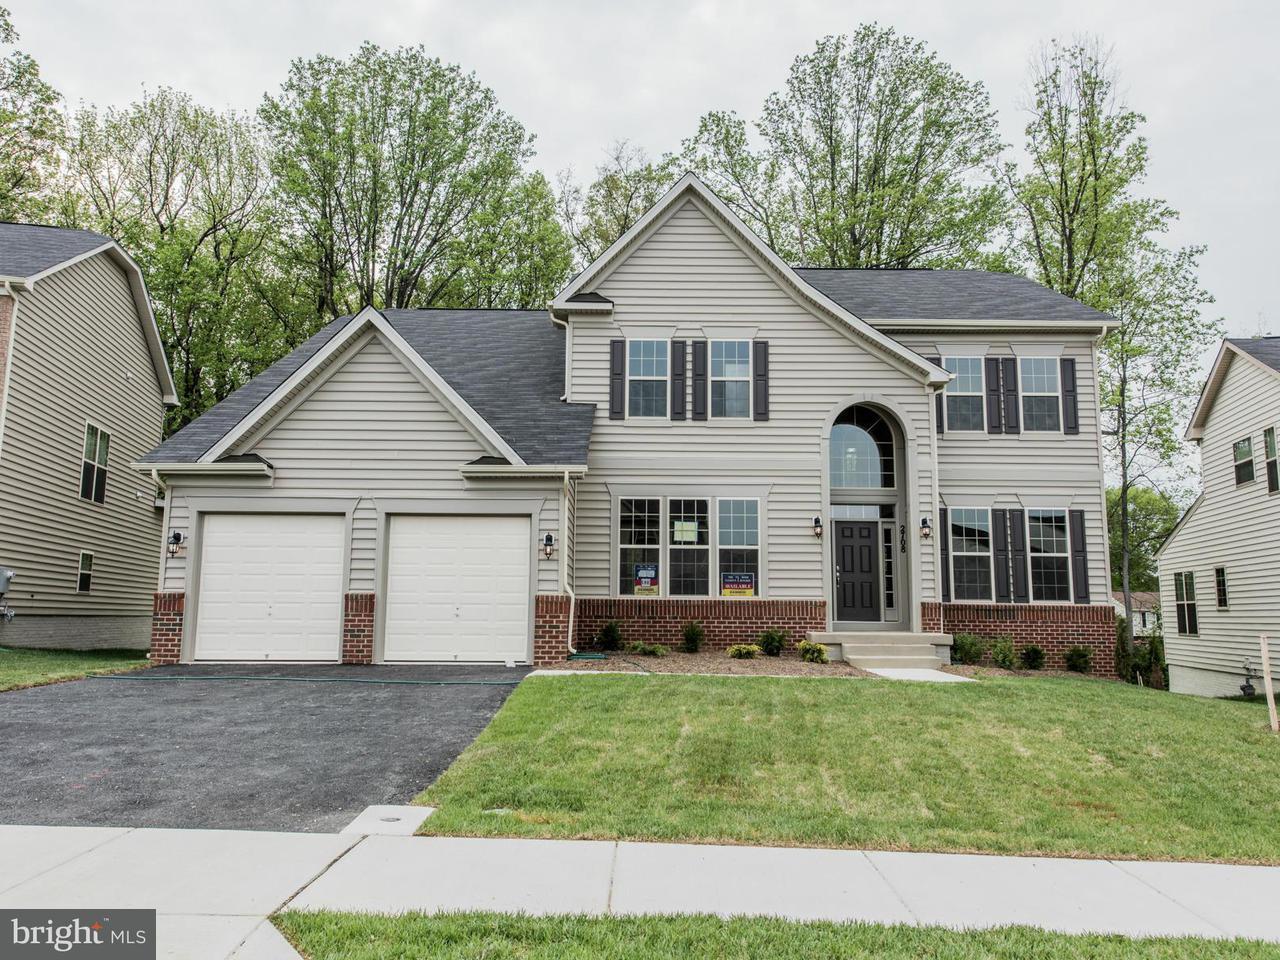 Single Family Home for Sale at 2402 ST. NICHOLAS WAY 2402 ST. NICHOLAS WAY Glenarden, Maryland 20706 United States